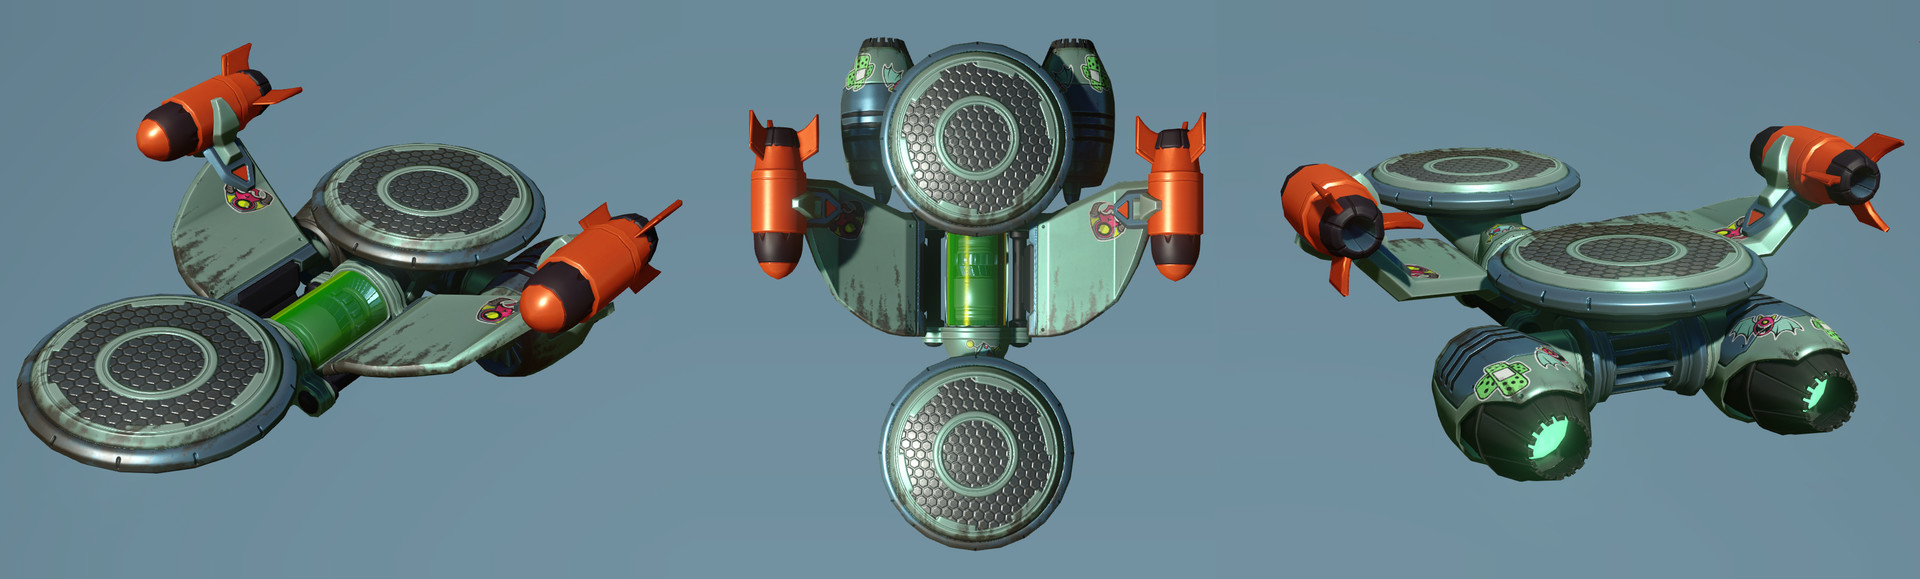 Artstation Ratchet Clank Ps4 Pixelizer Hoverboard Erin Zaneski